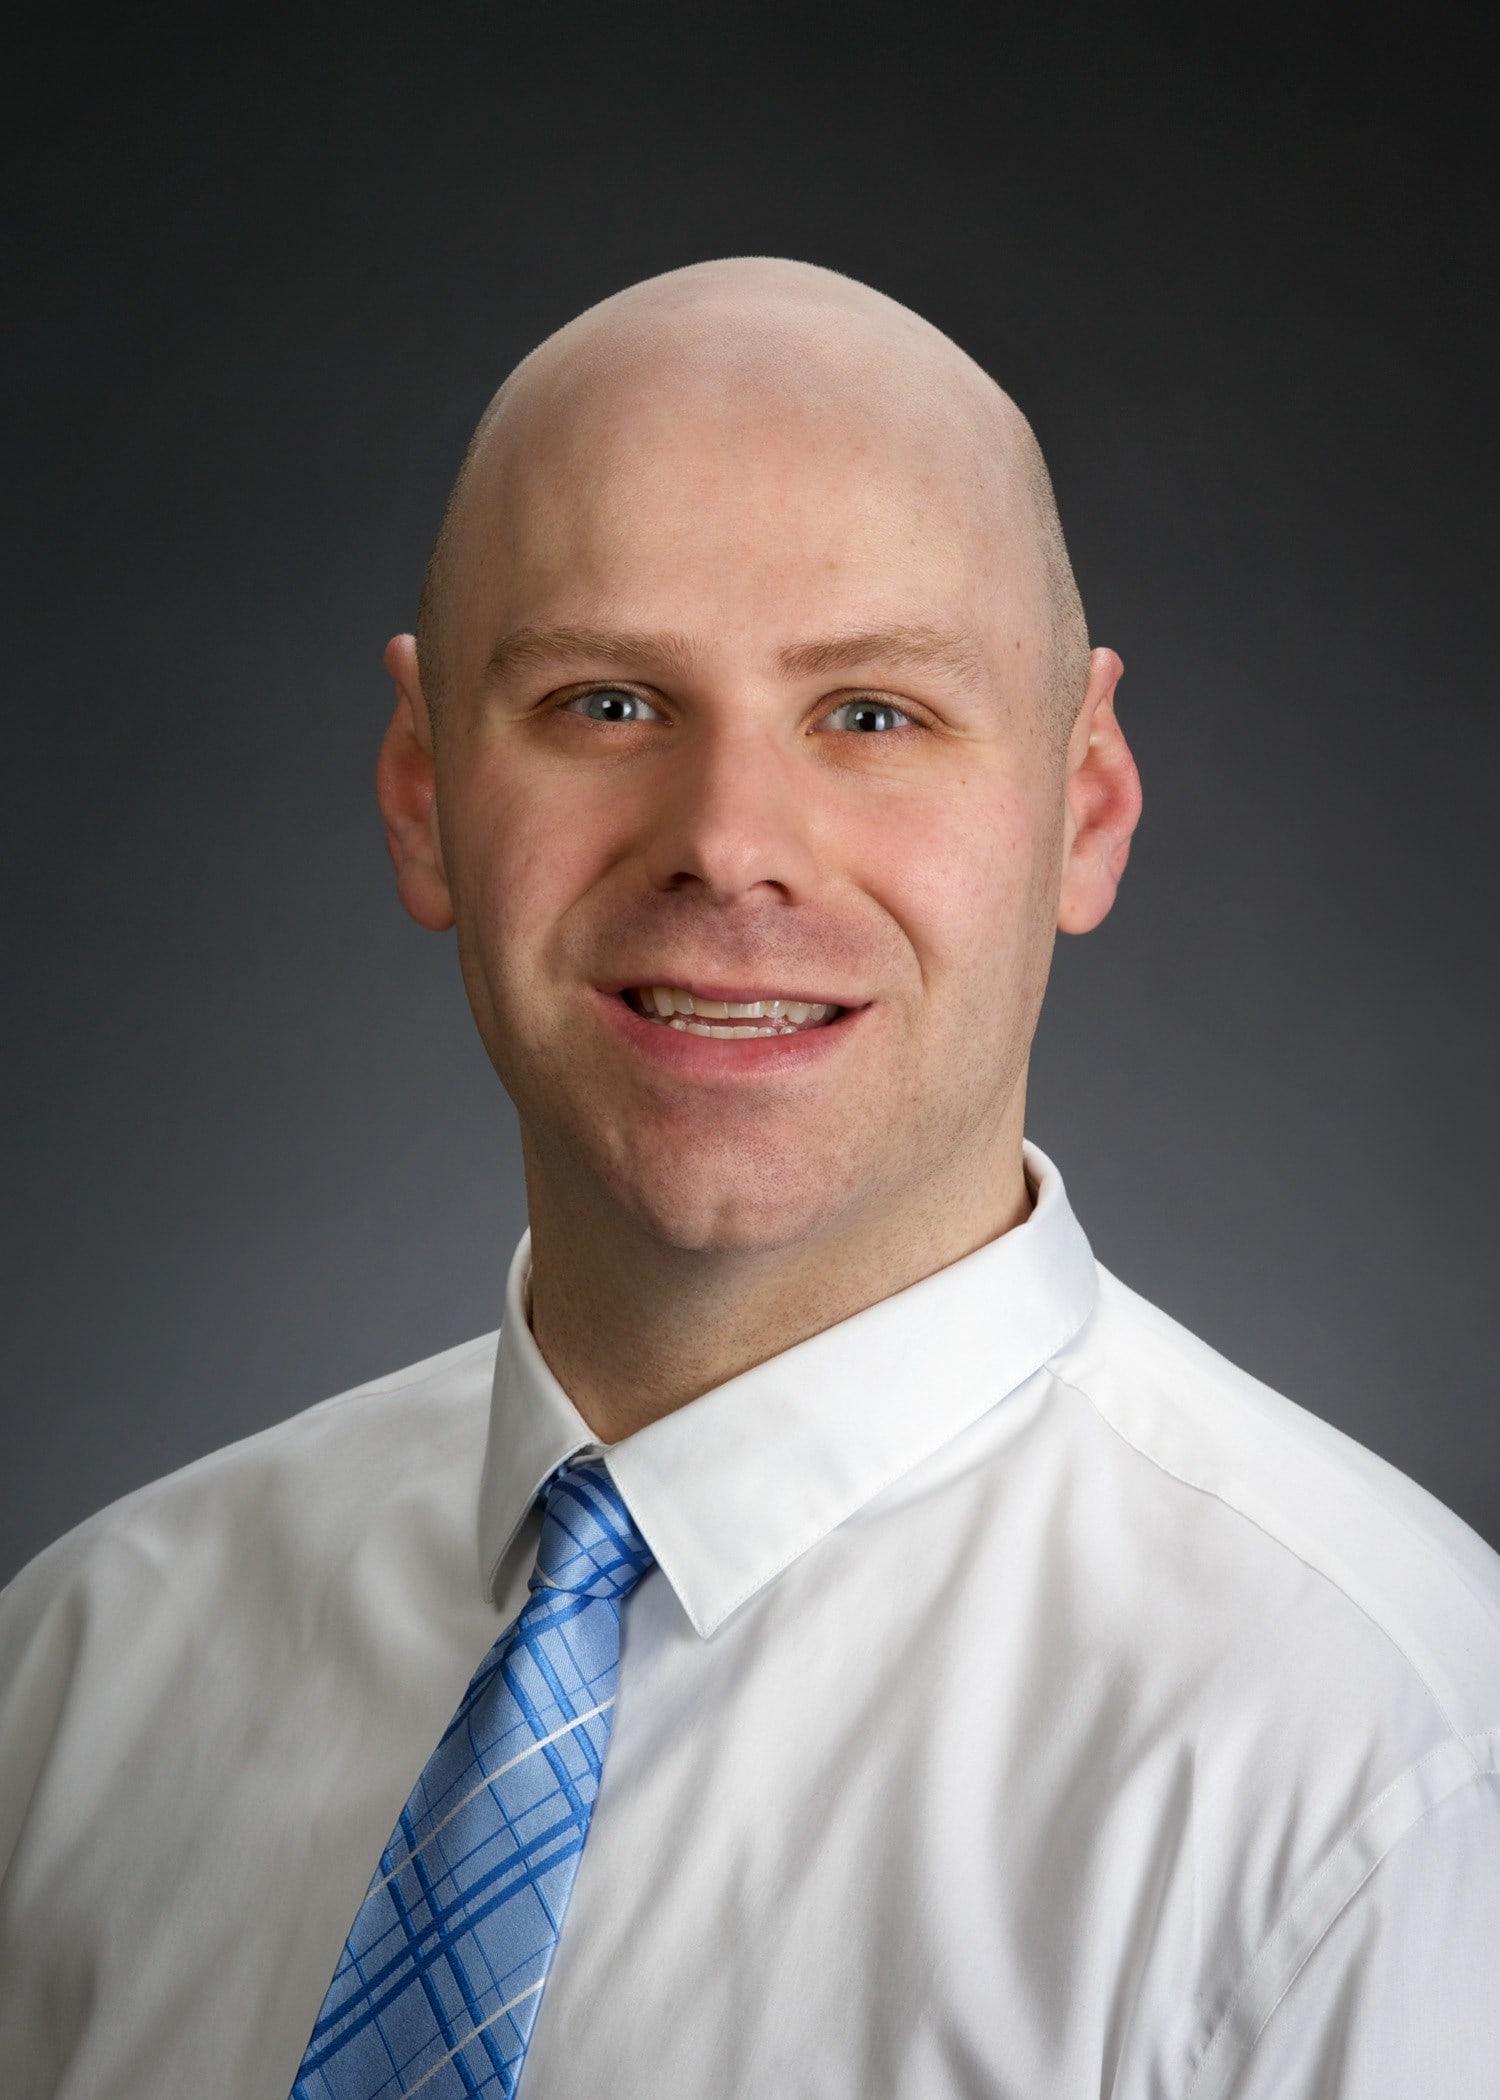 Dr. Brian W Burkhart MD